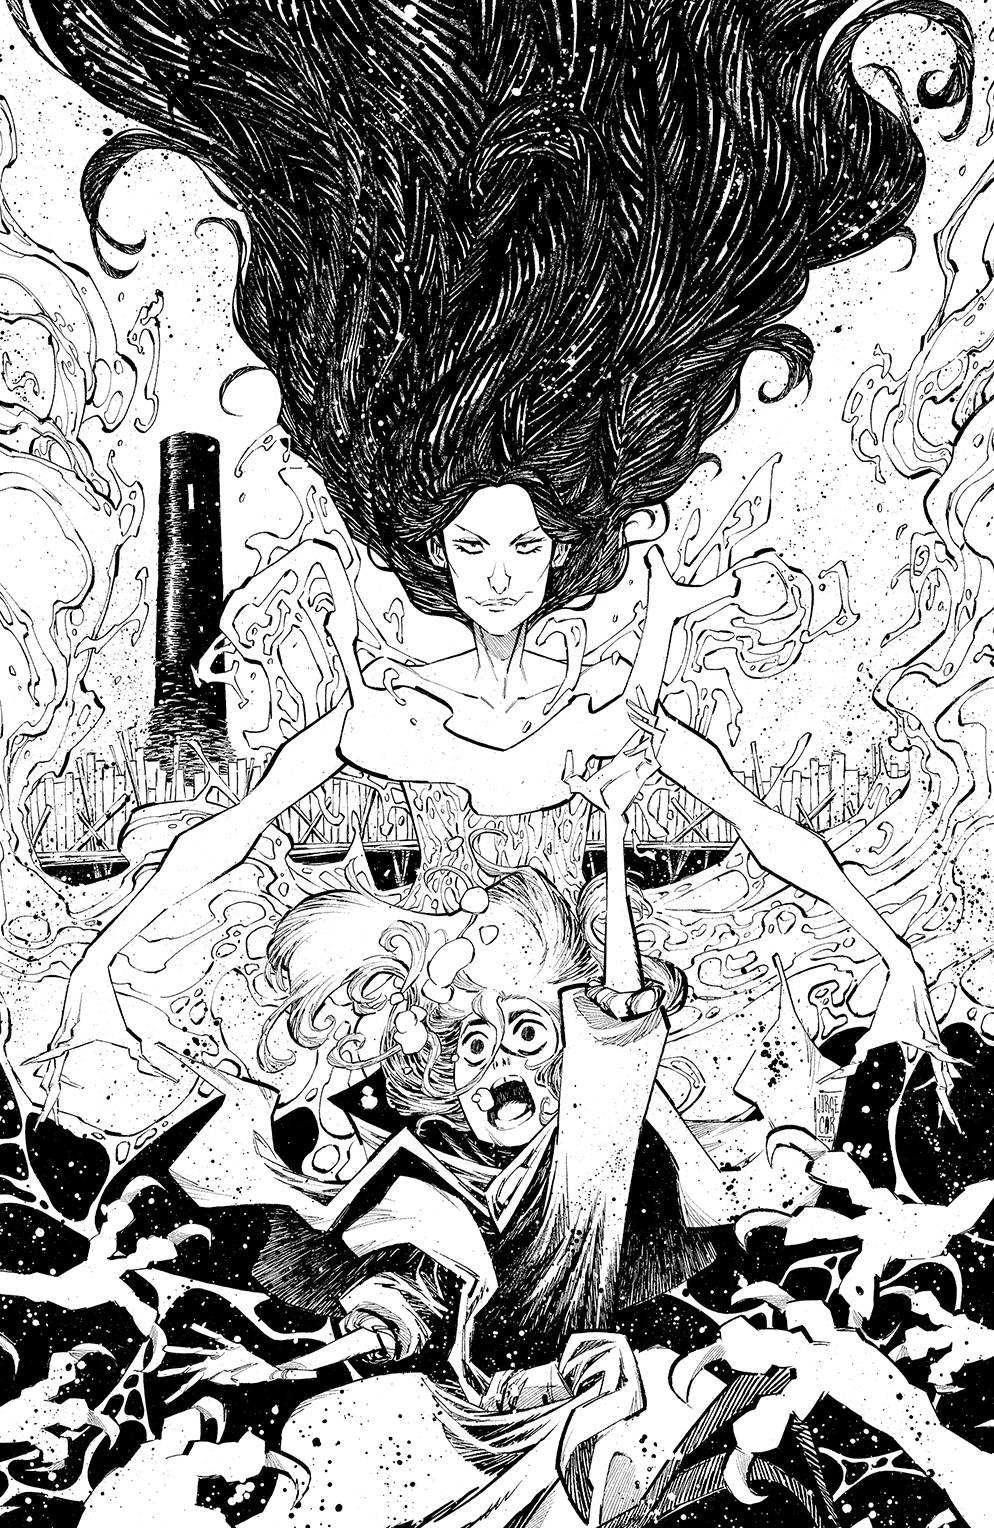 STL180187 ComicList: BOOM! Studios New Releases for 03/10/2021